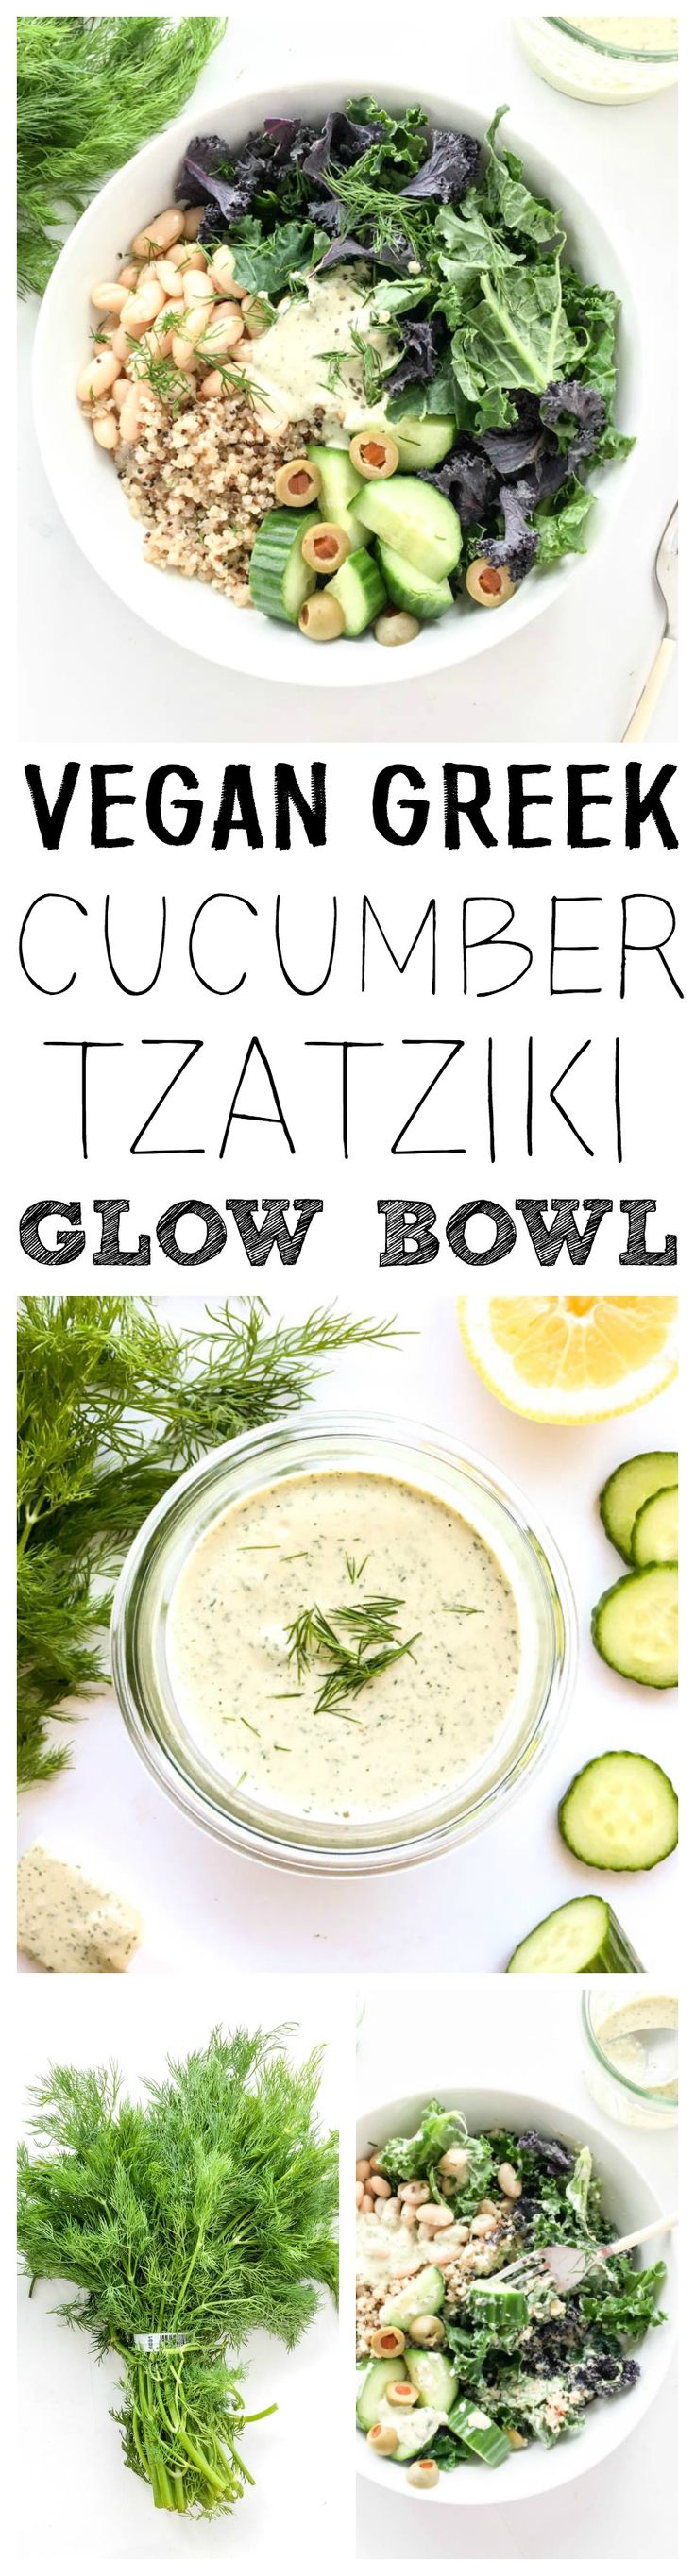 Vegan, Gluten Free. 'Greek Cucumber Tzatziki Glow Bowl'. Refreshing, simple and bright! Kale, quinoa, white bean